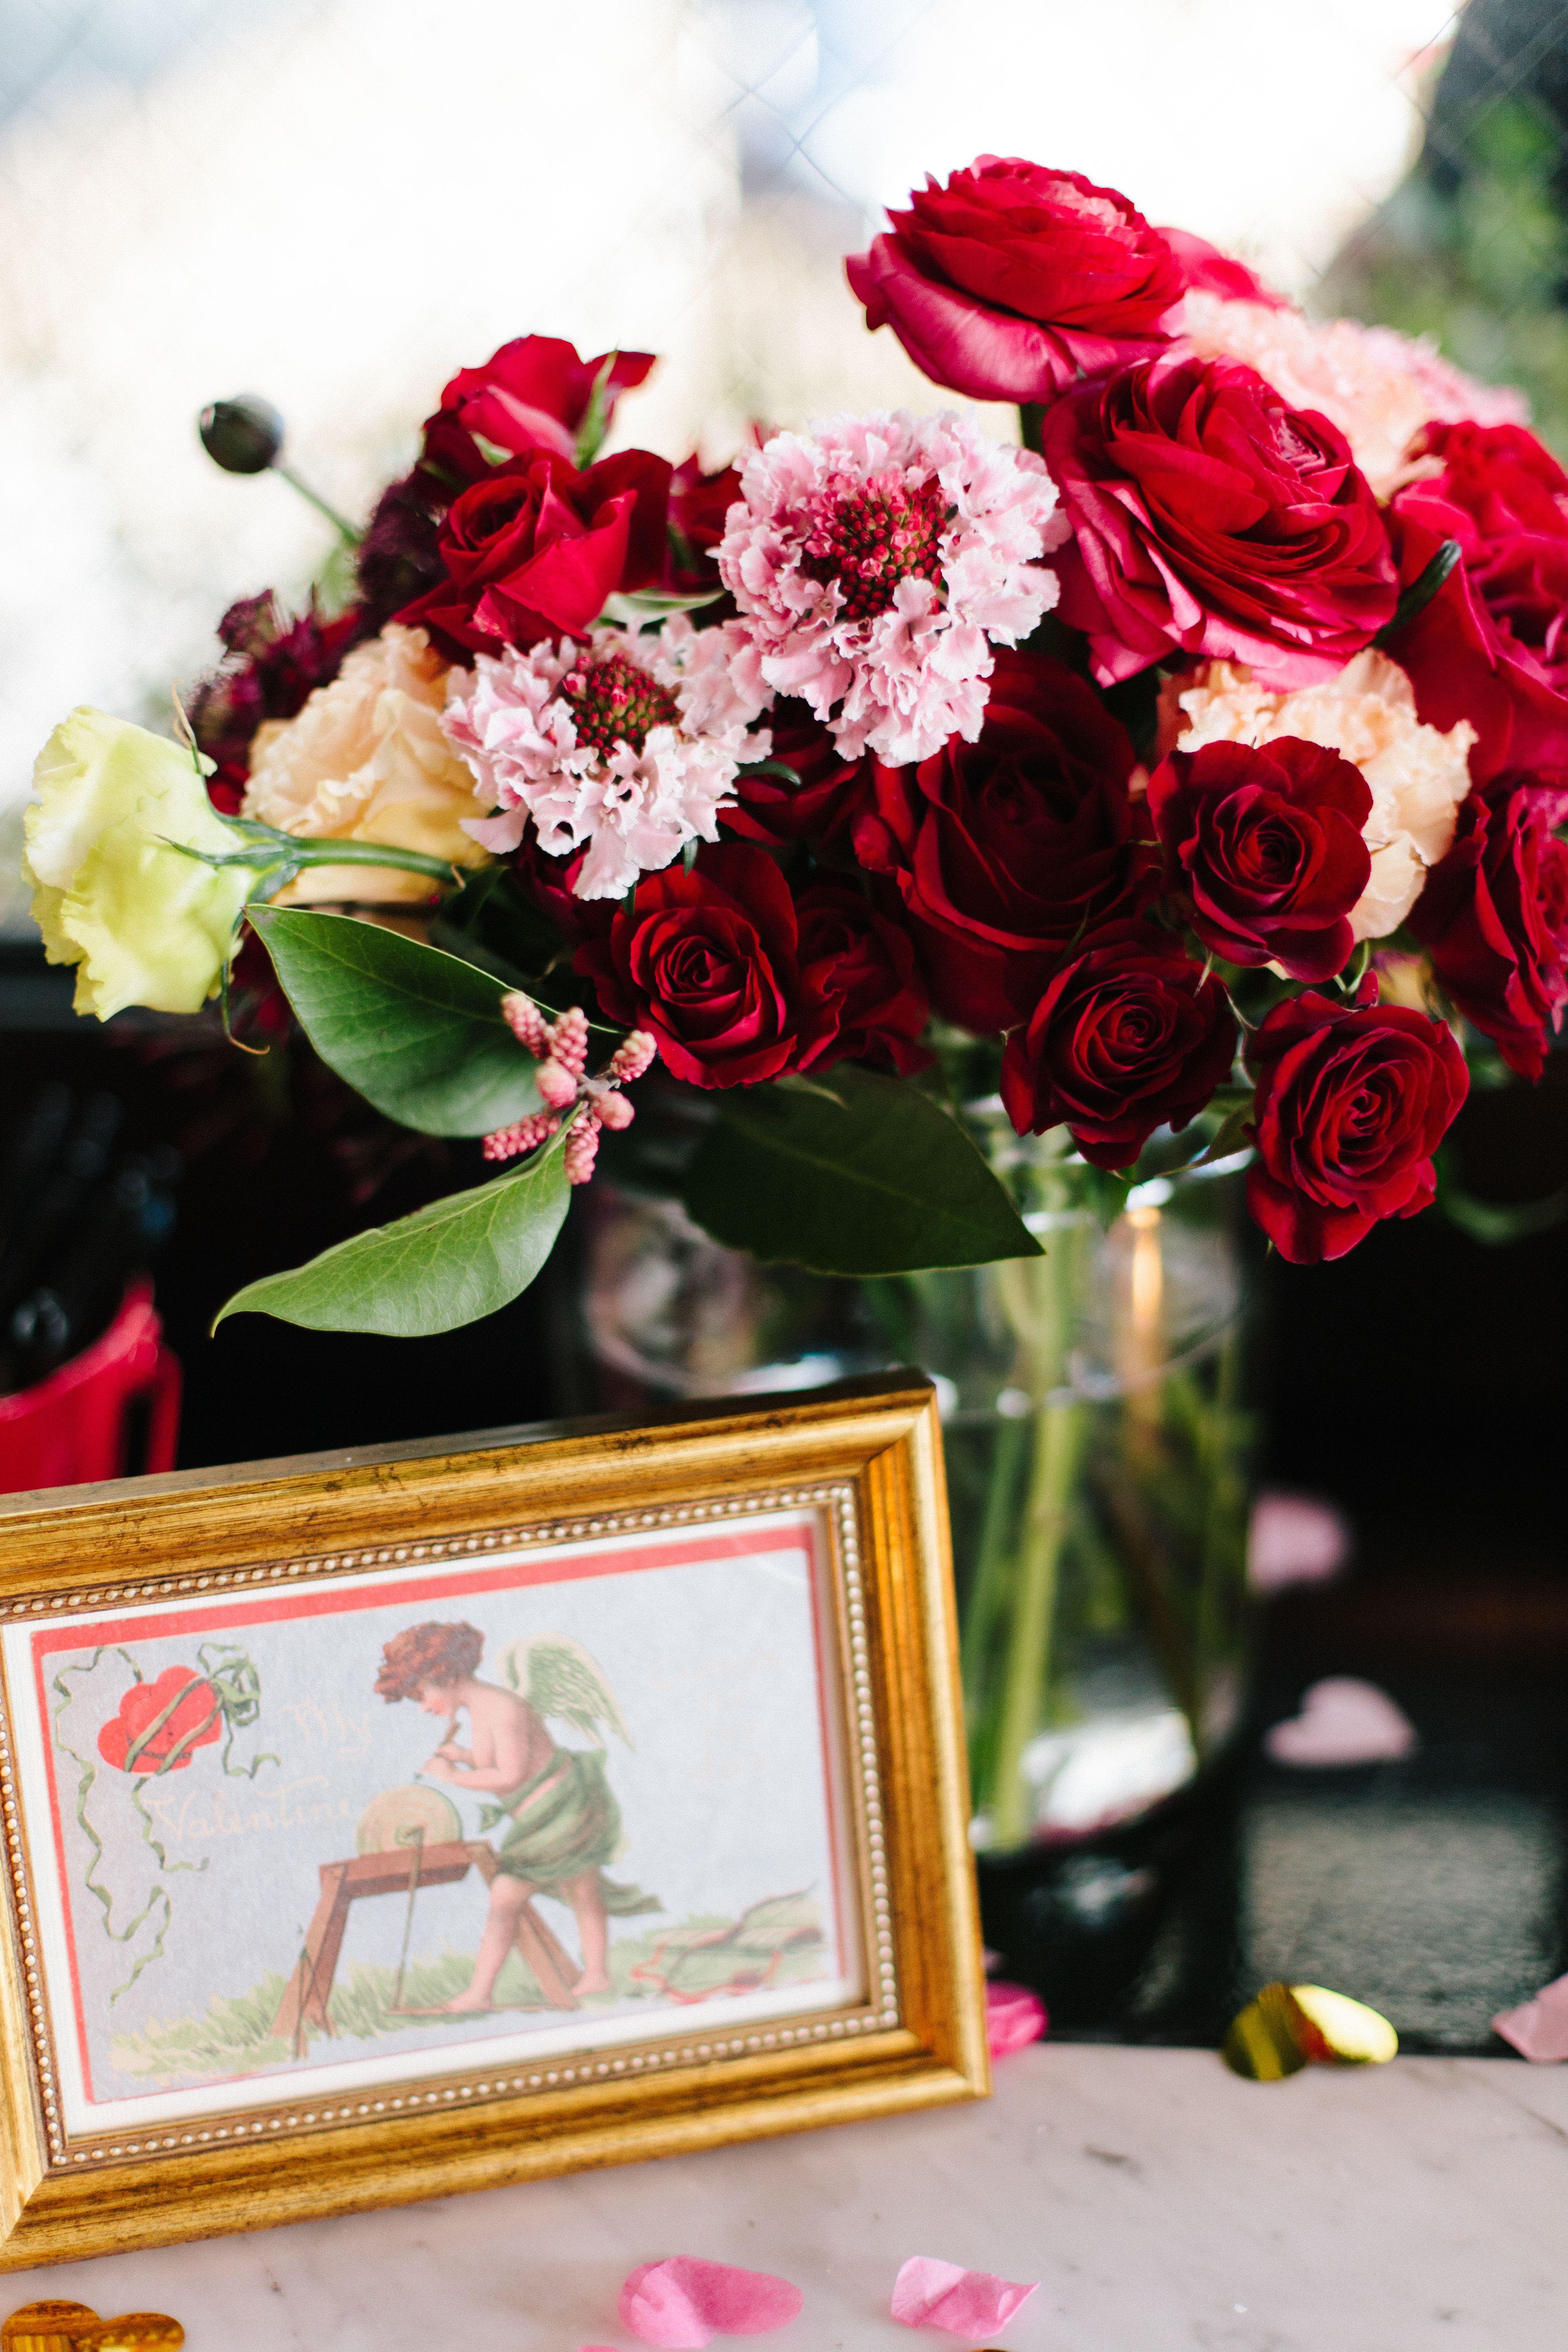 Wedding decorations black and gold  GoldFramed Valentineus Day Postcards  WEDDING GOWNS   Pinterest